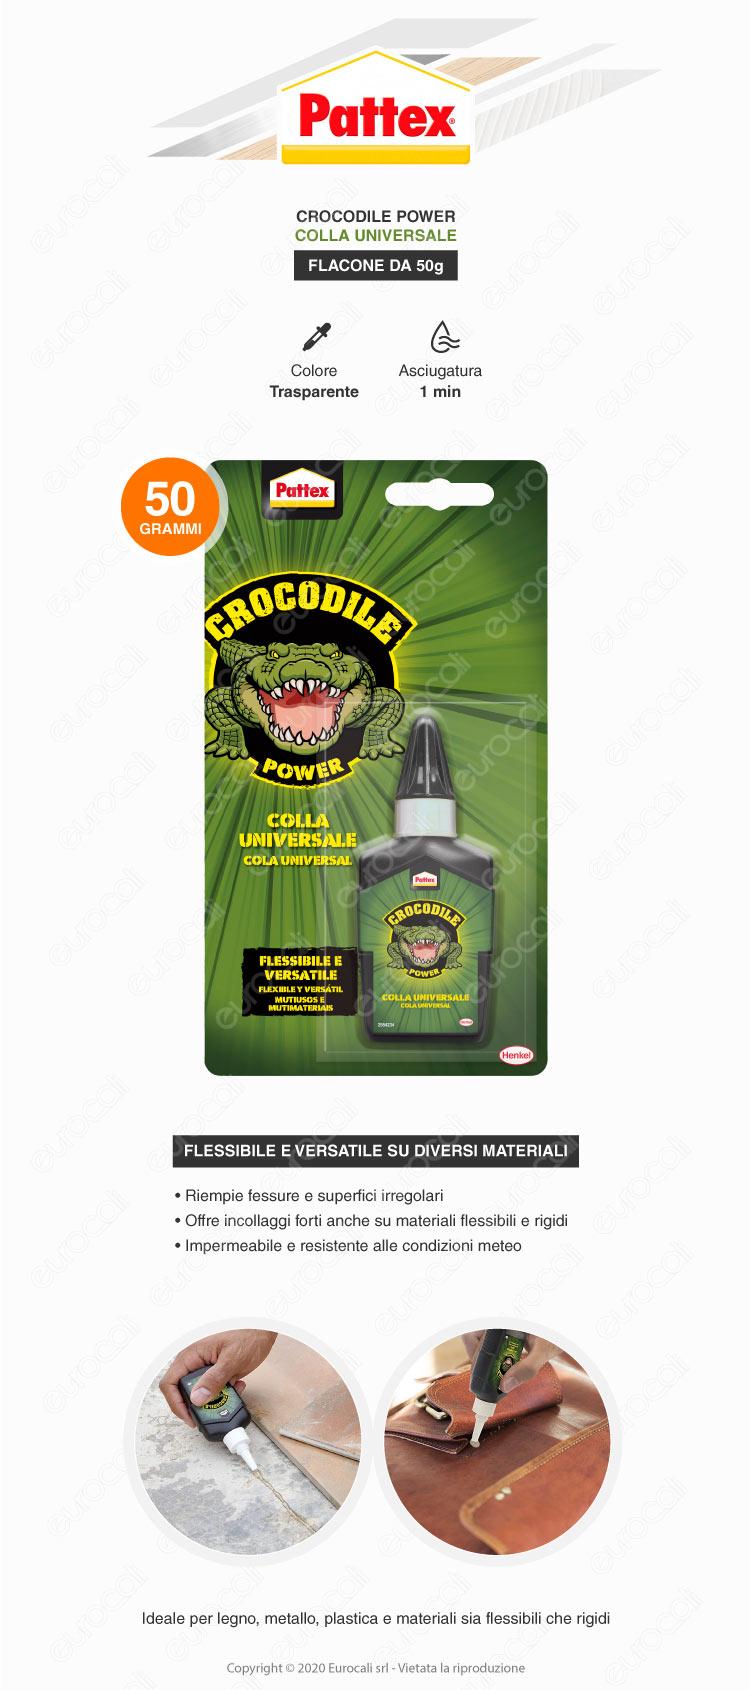 pattex crocodile